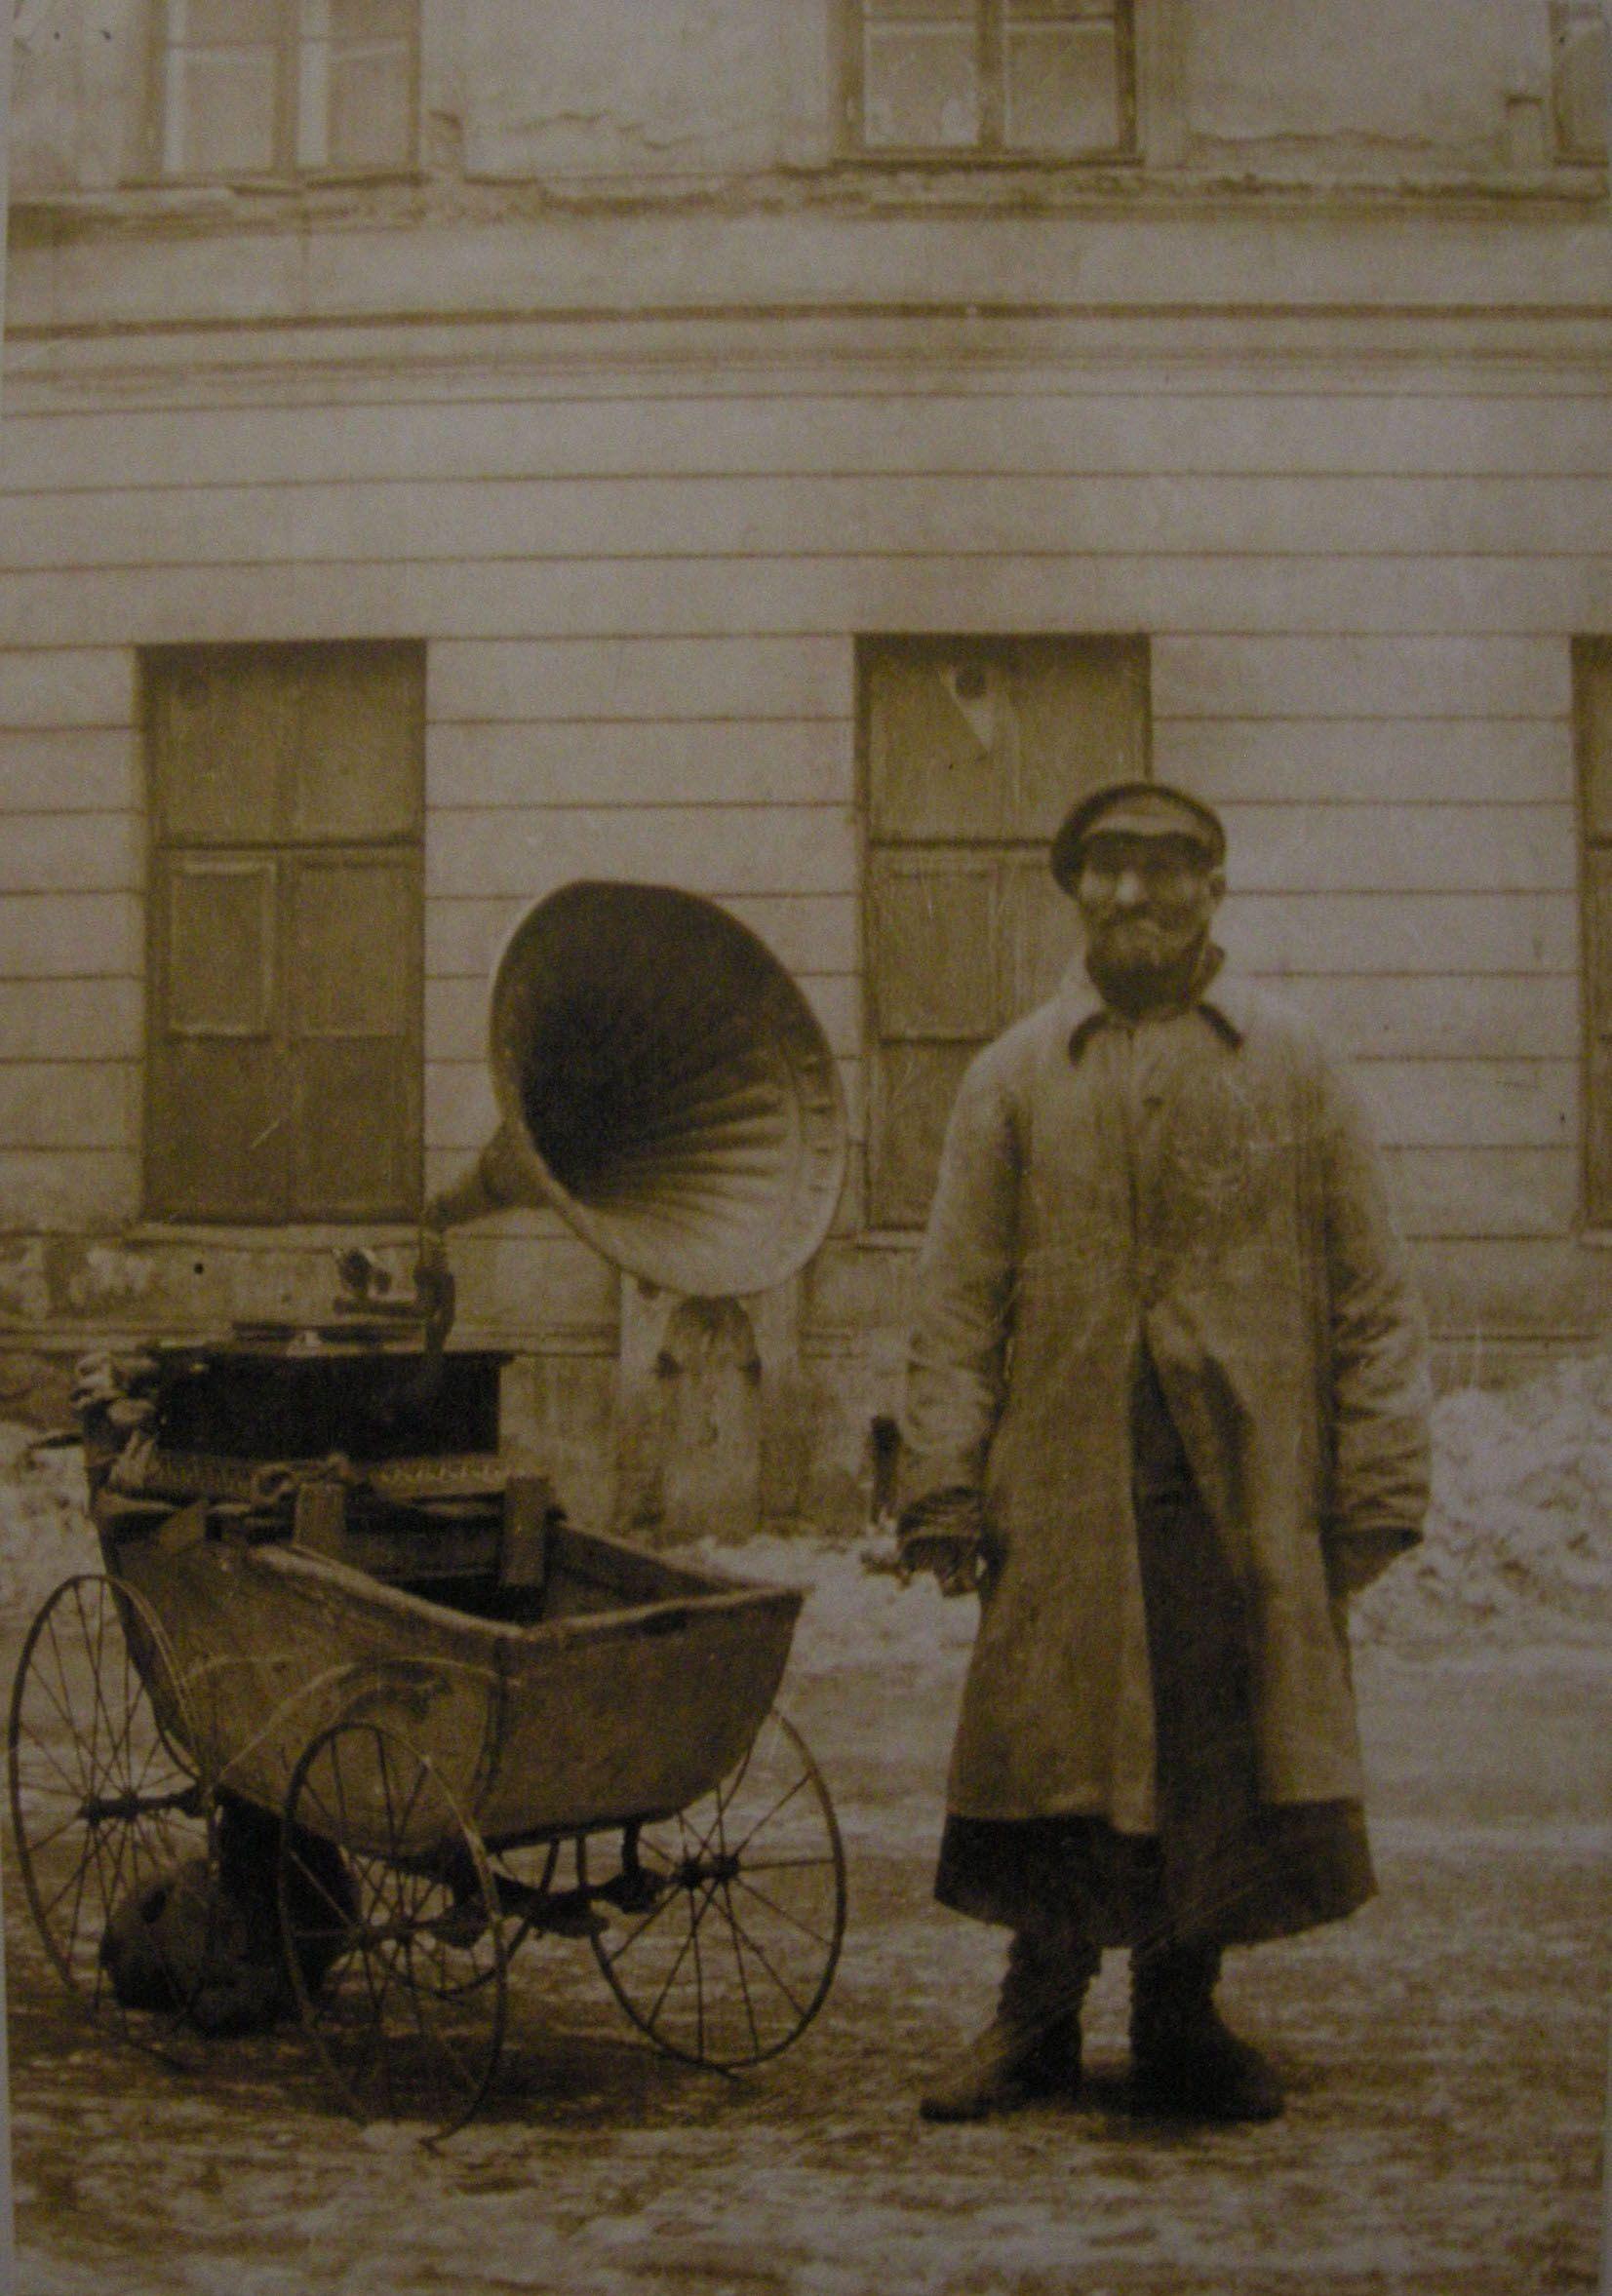 Poemas del río Wang: The photos of Menachem Kipnis